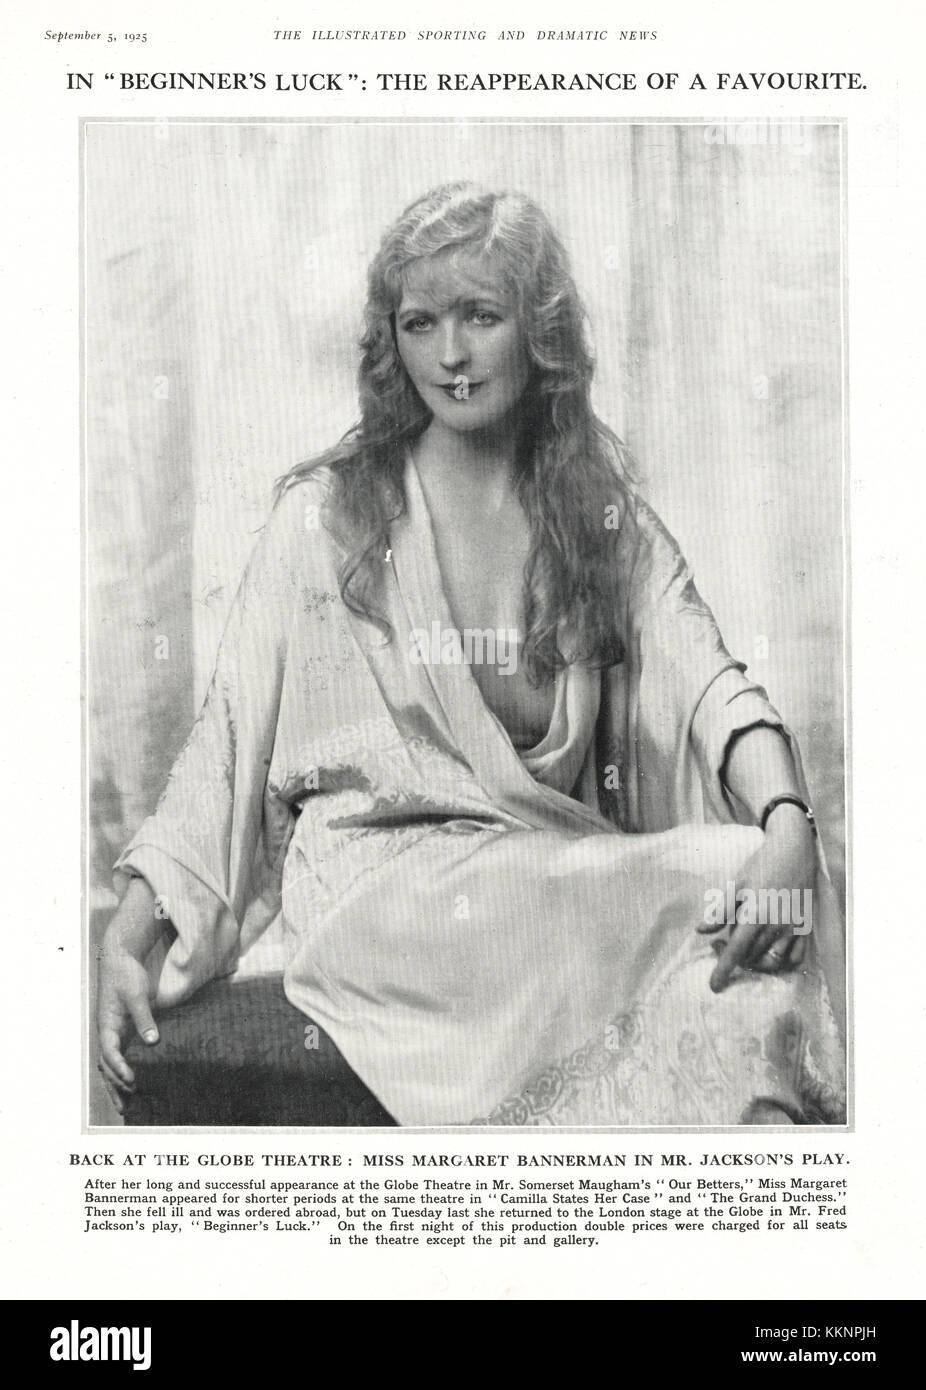 Margaret Bannerman